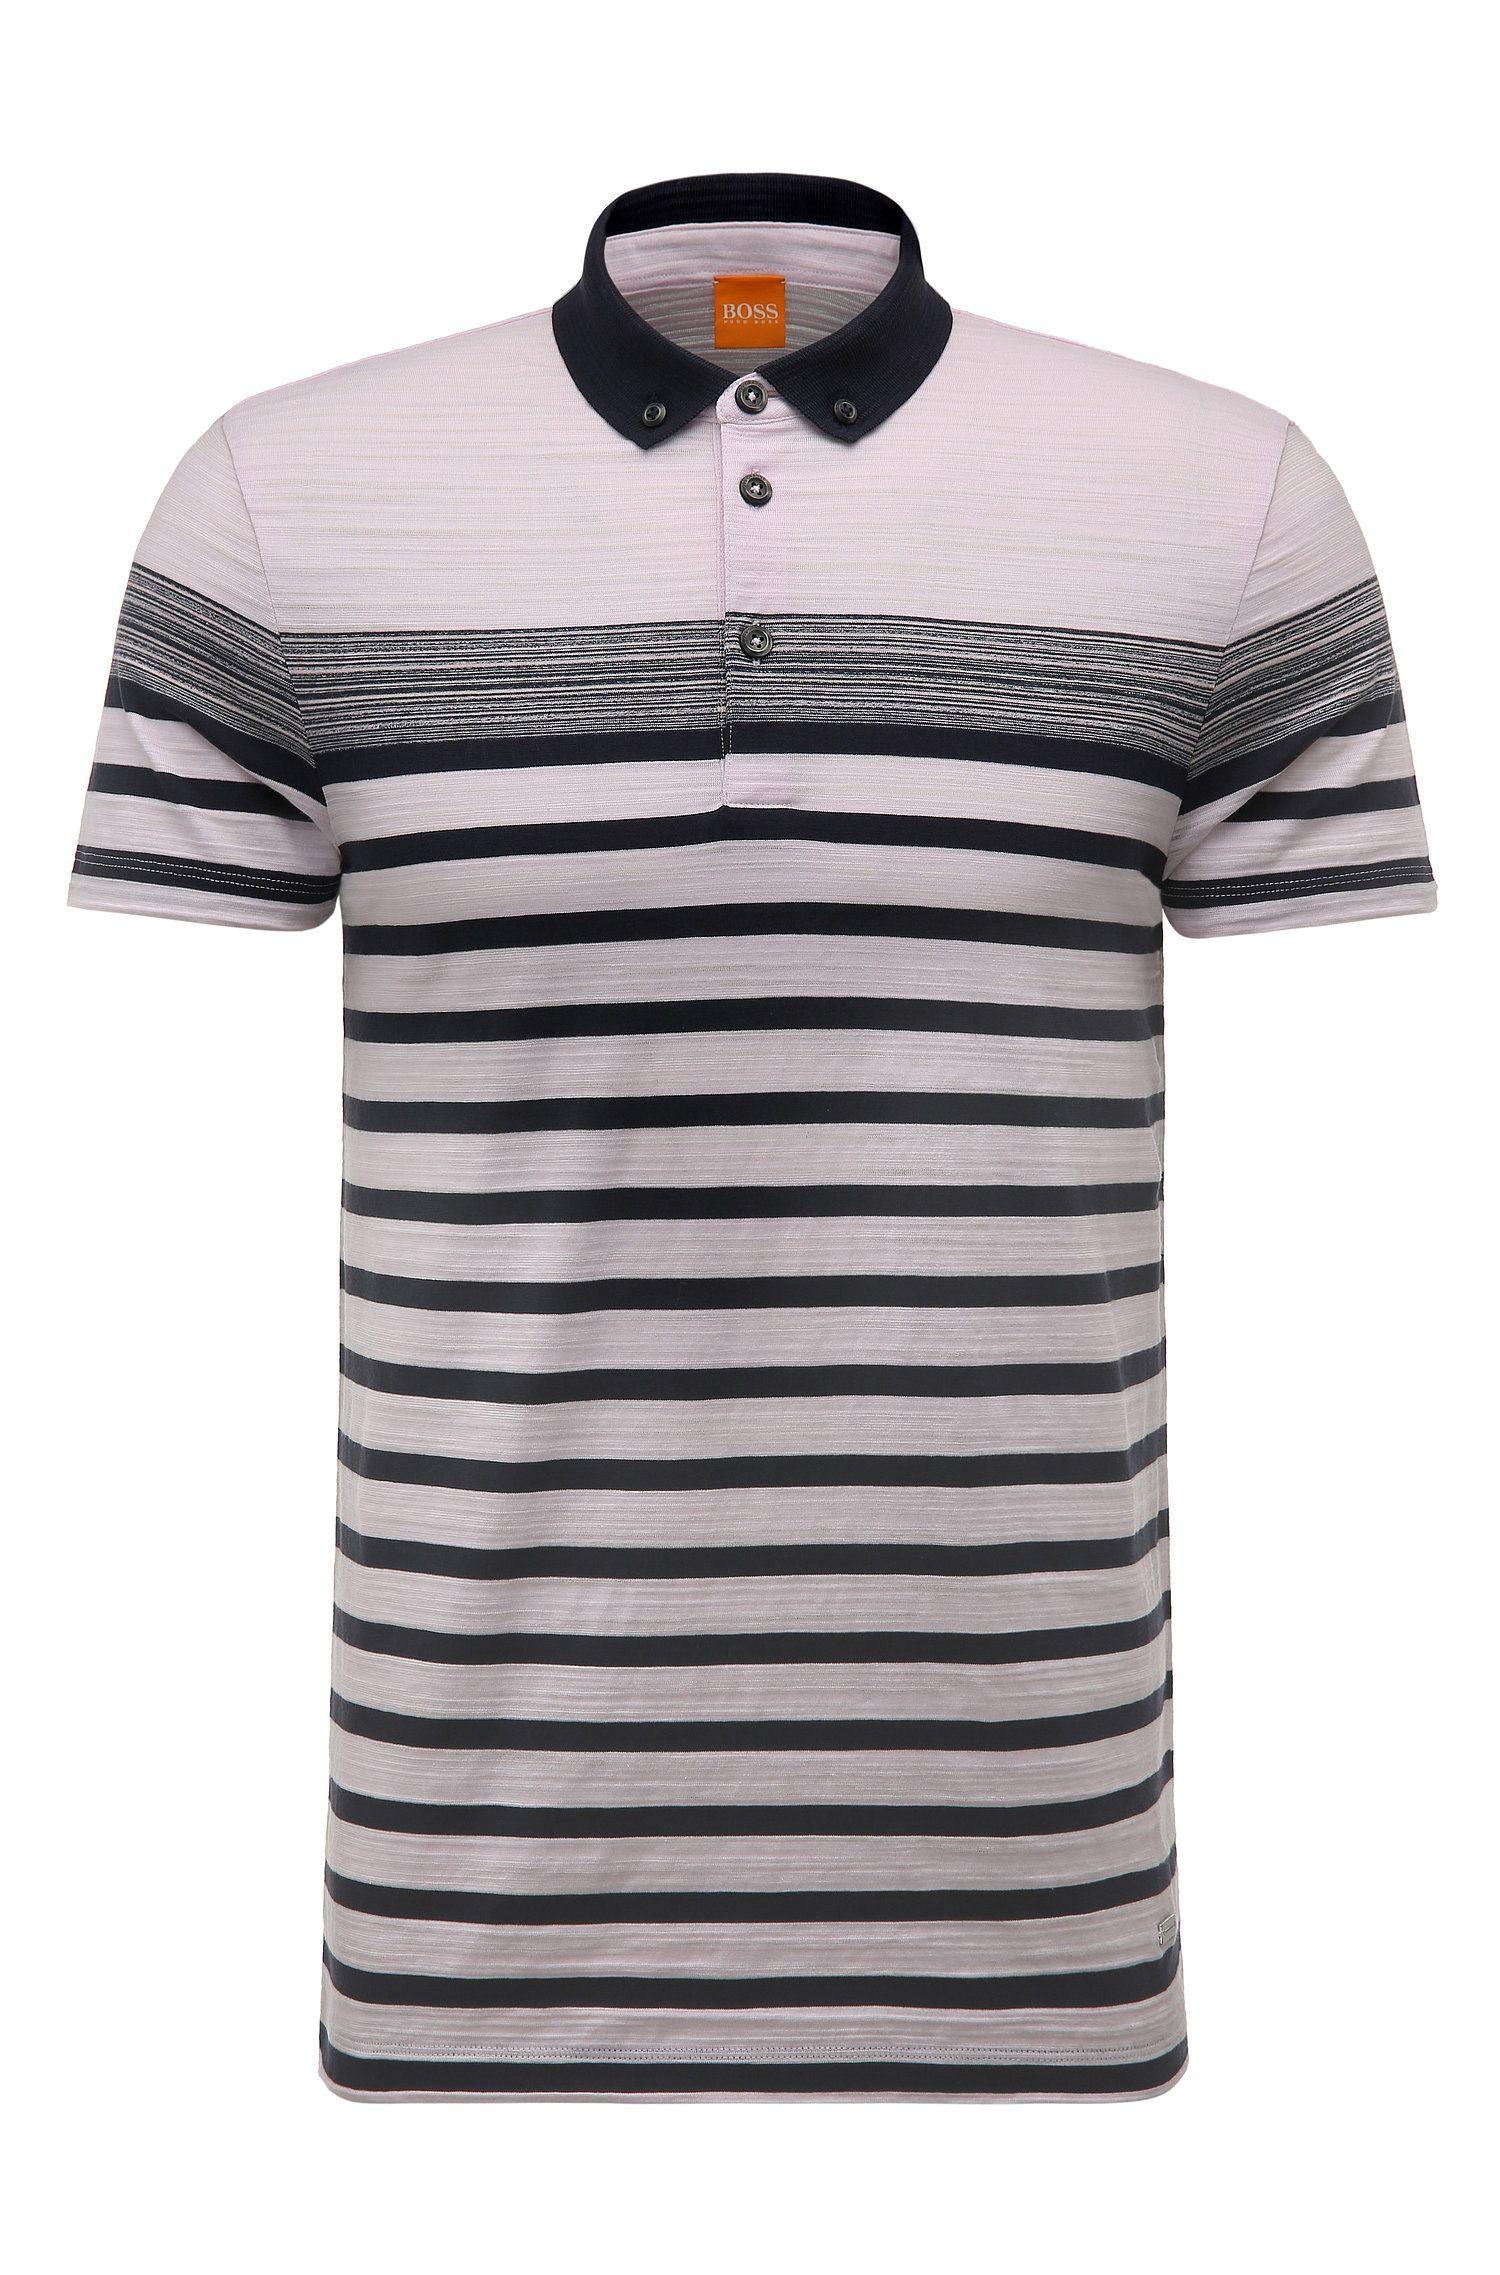 'Promo' | Regular Fit, Striped Cotton Polo Shirt